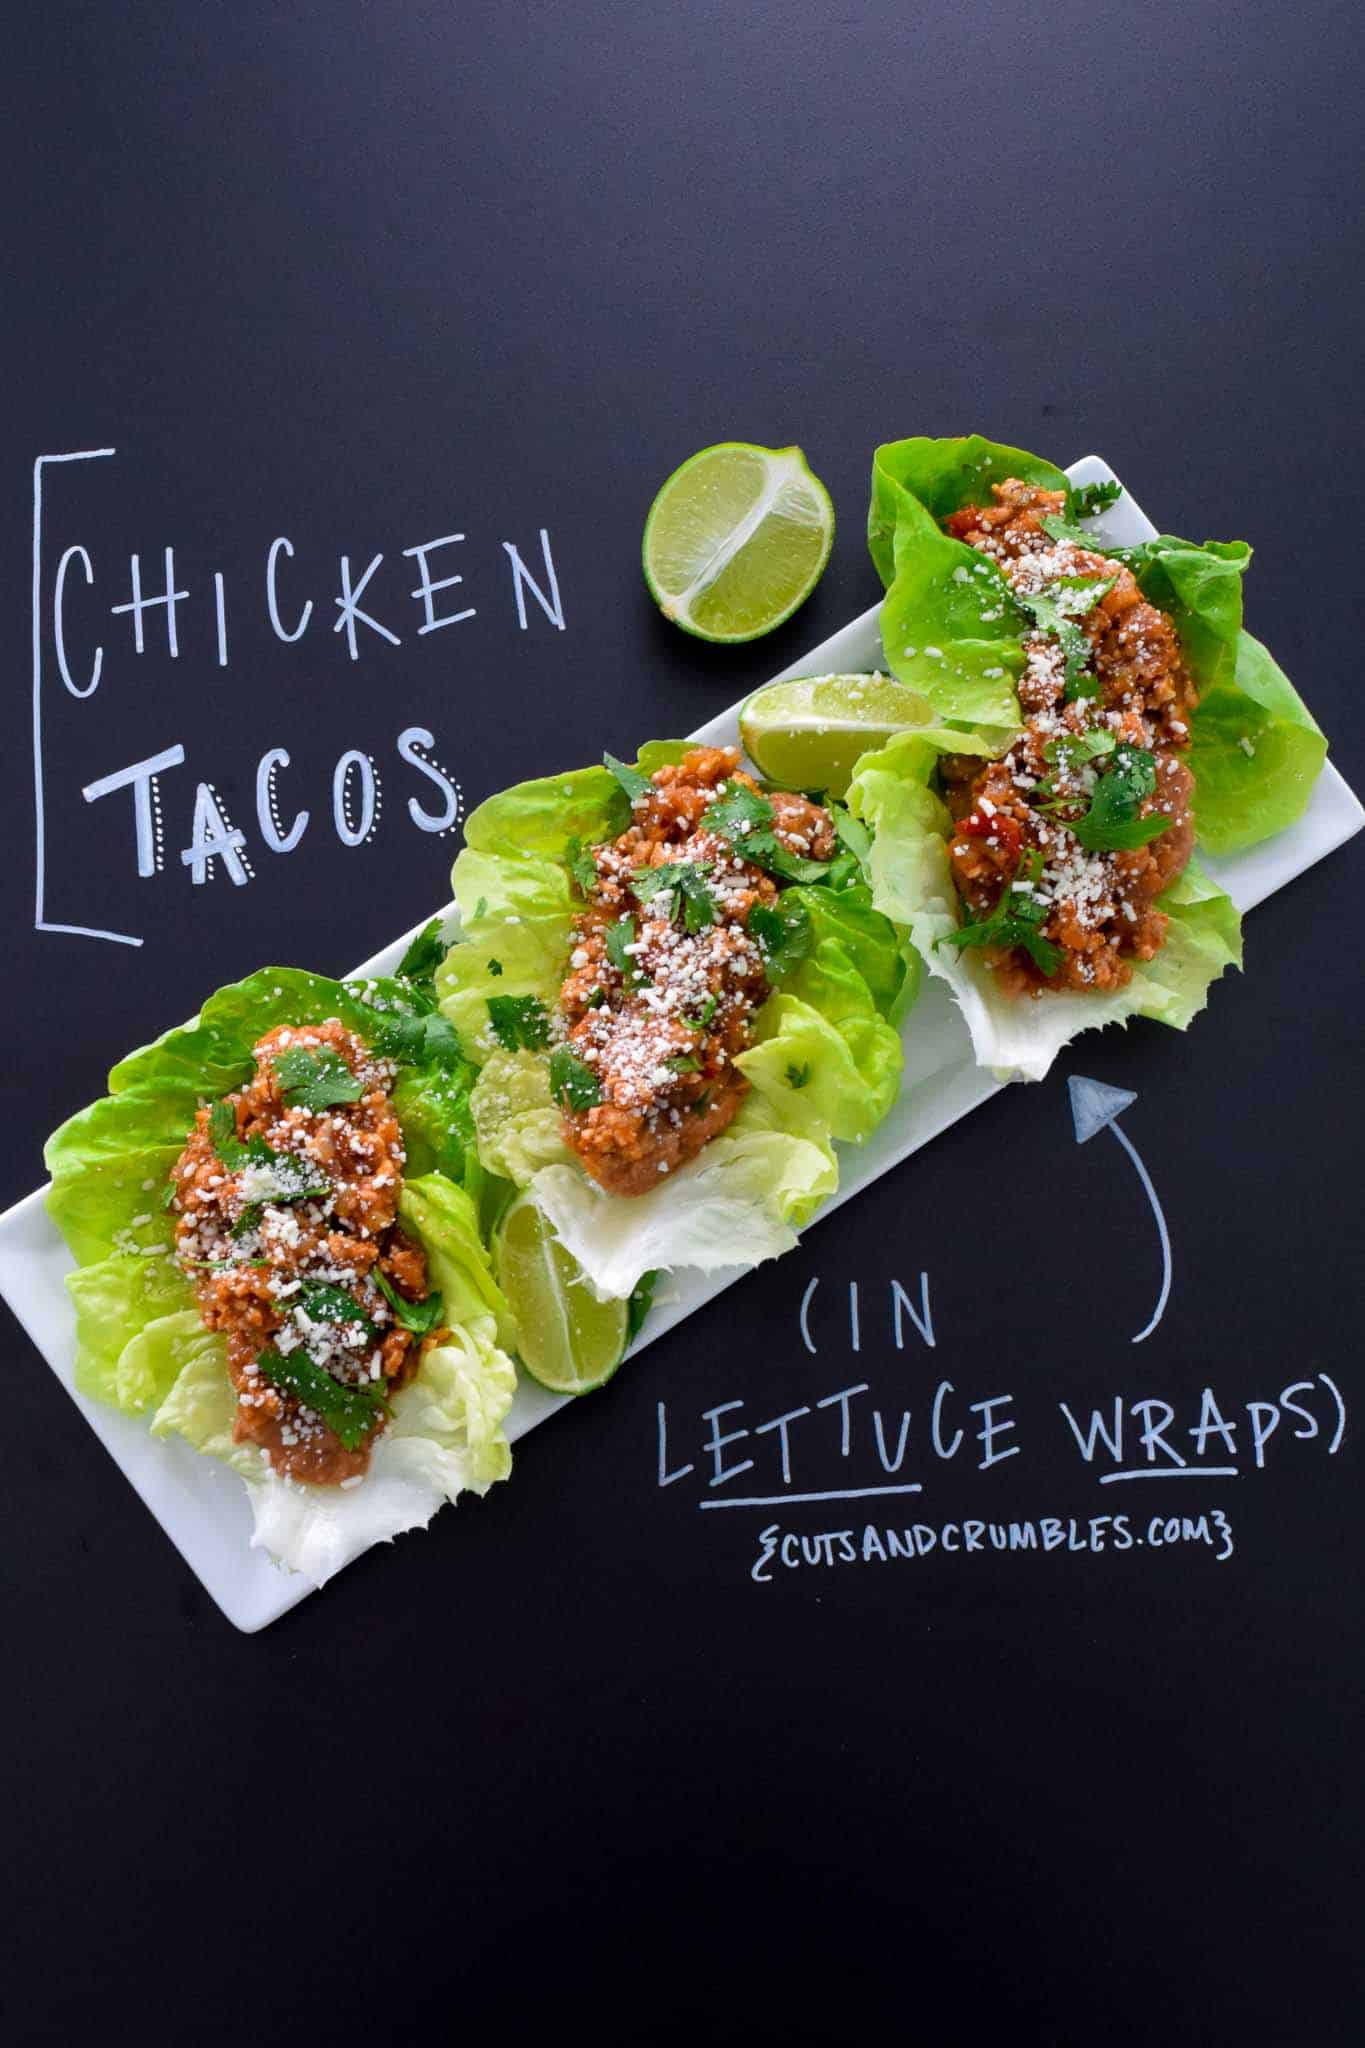 Chicken Tacos in Lettuce Wraps with title written on chalkboard